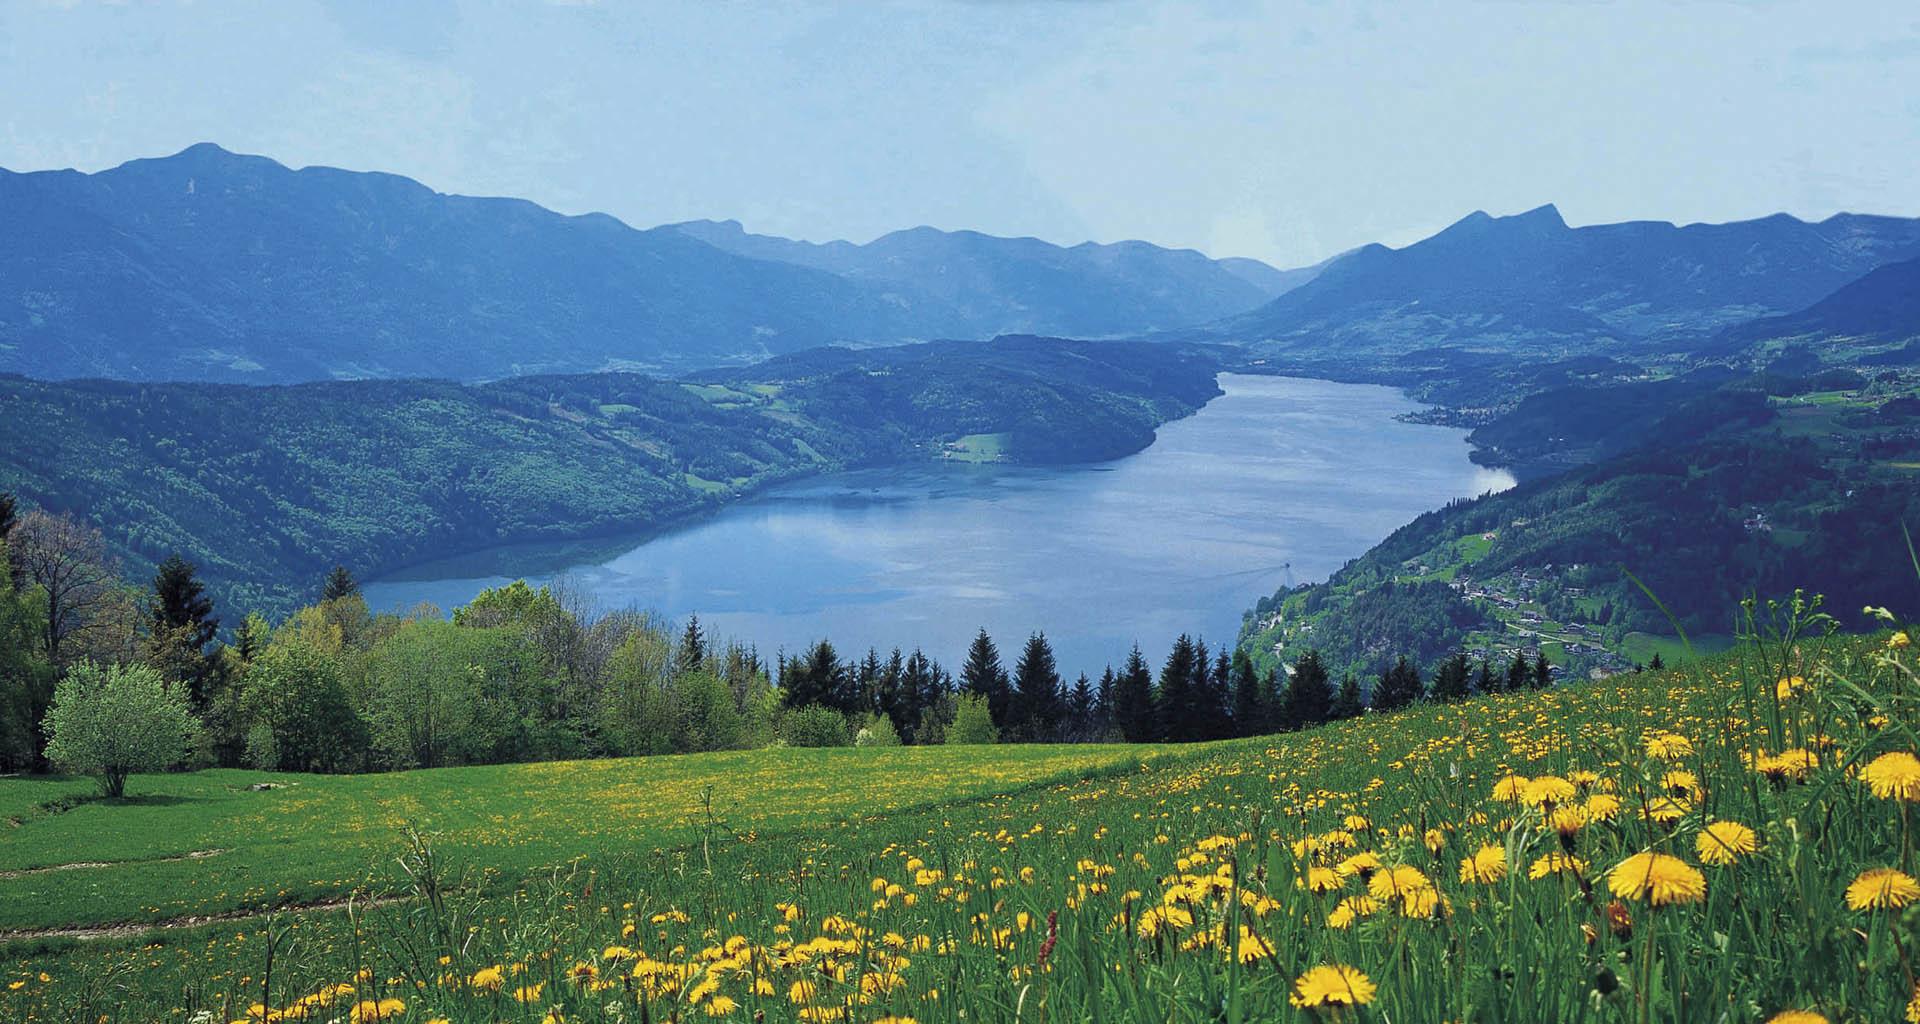 Landschaftsbild-Millstätter-See